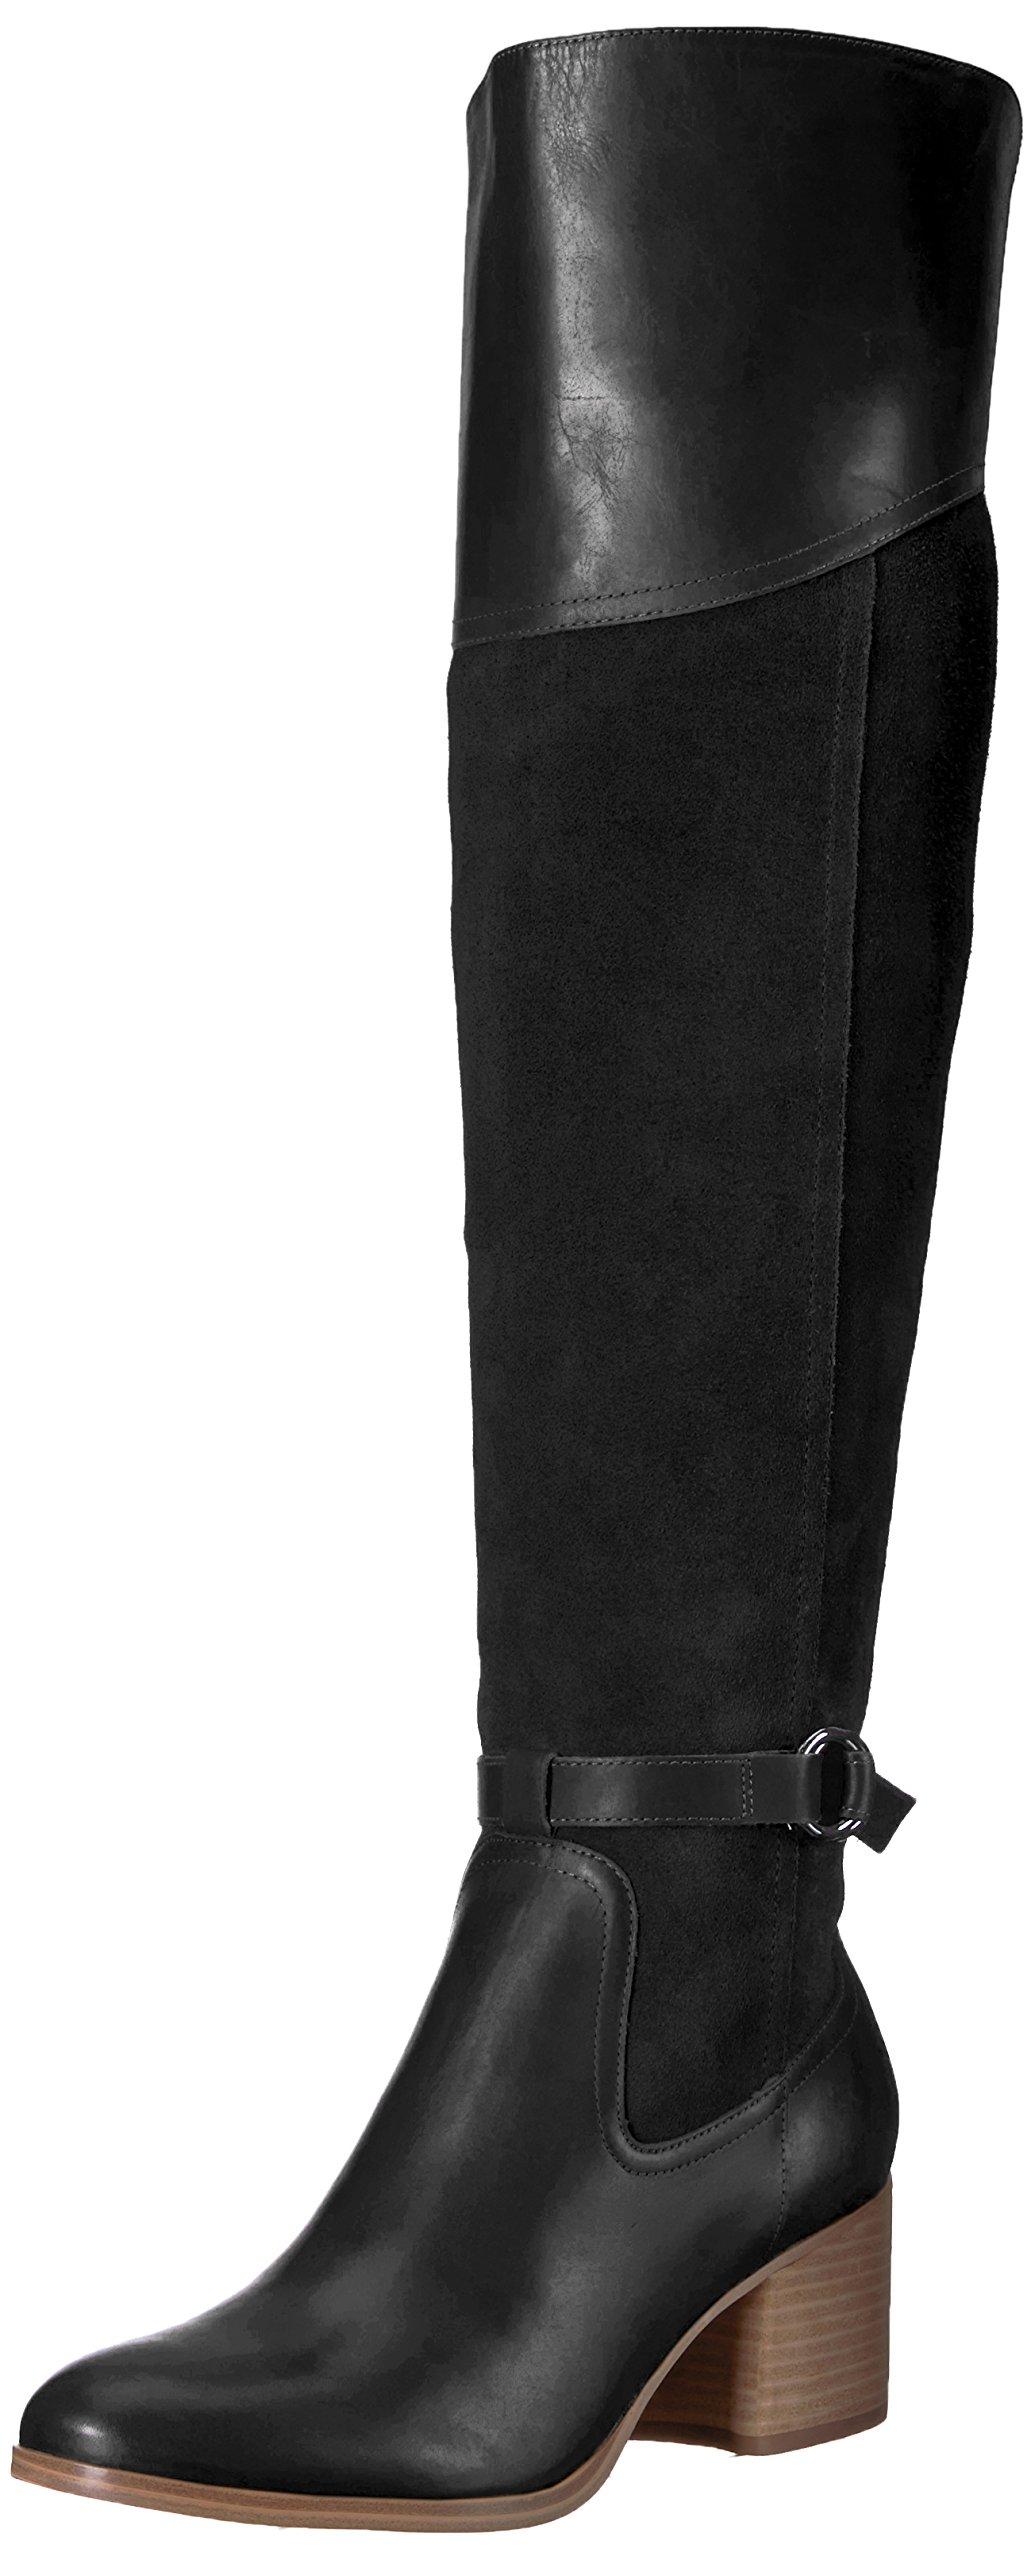 Marc Fisher Women's Eisa Fashion Boot, Black 970, 7 Medium US